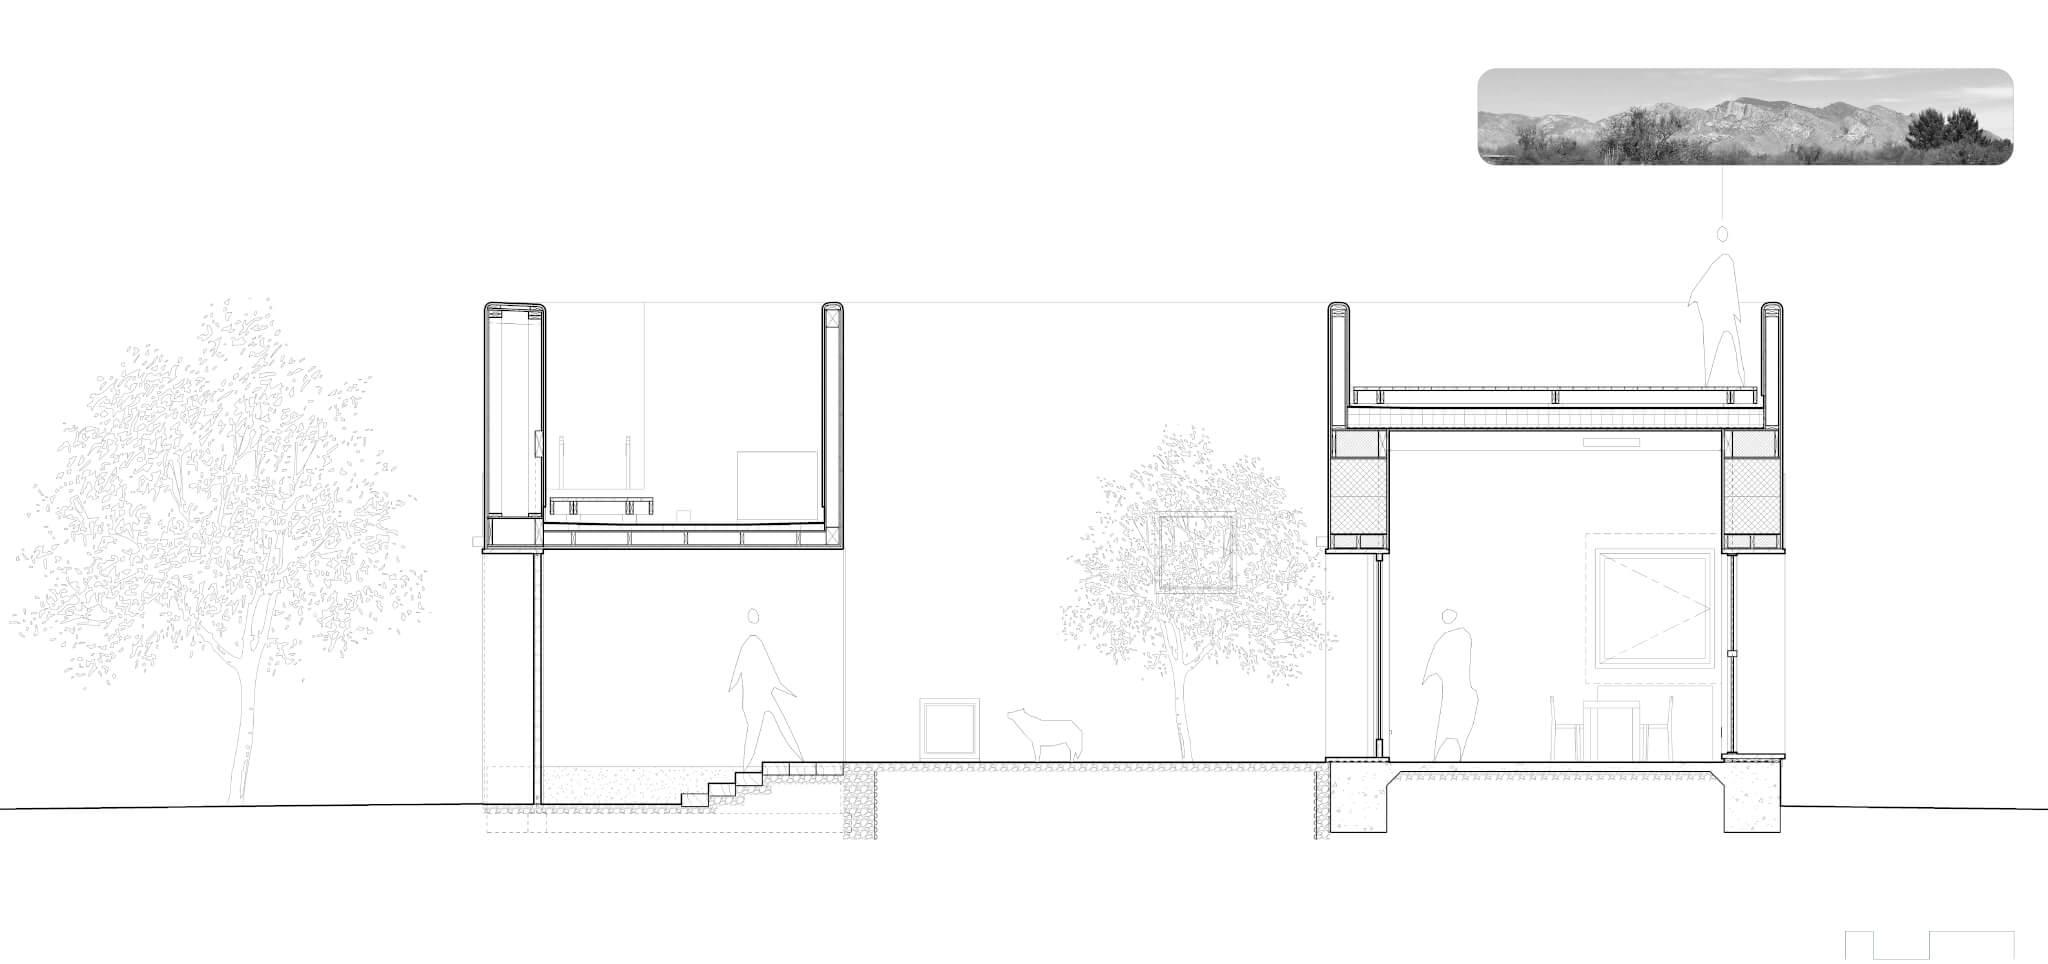 PS_casa de paja_section W-E